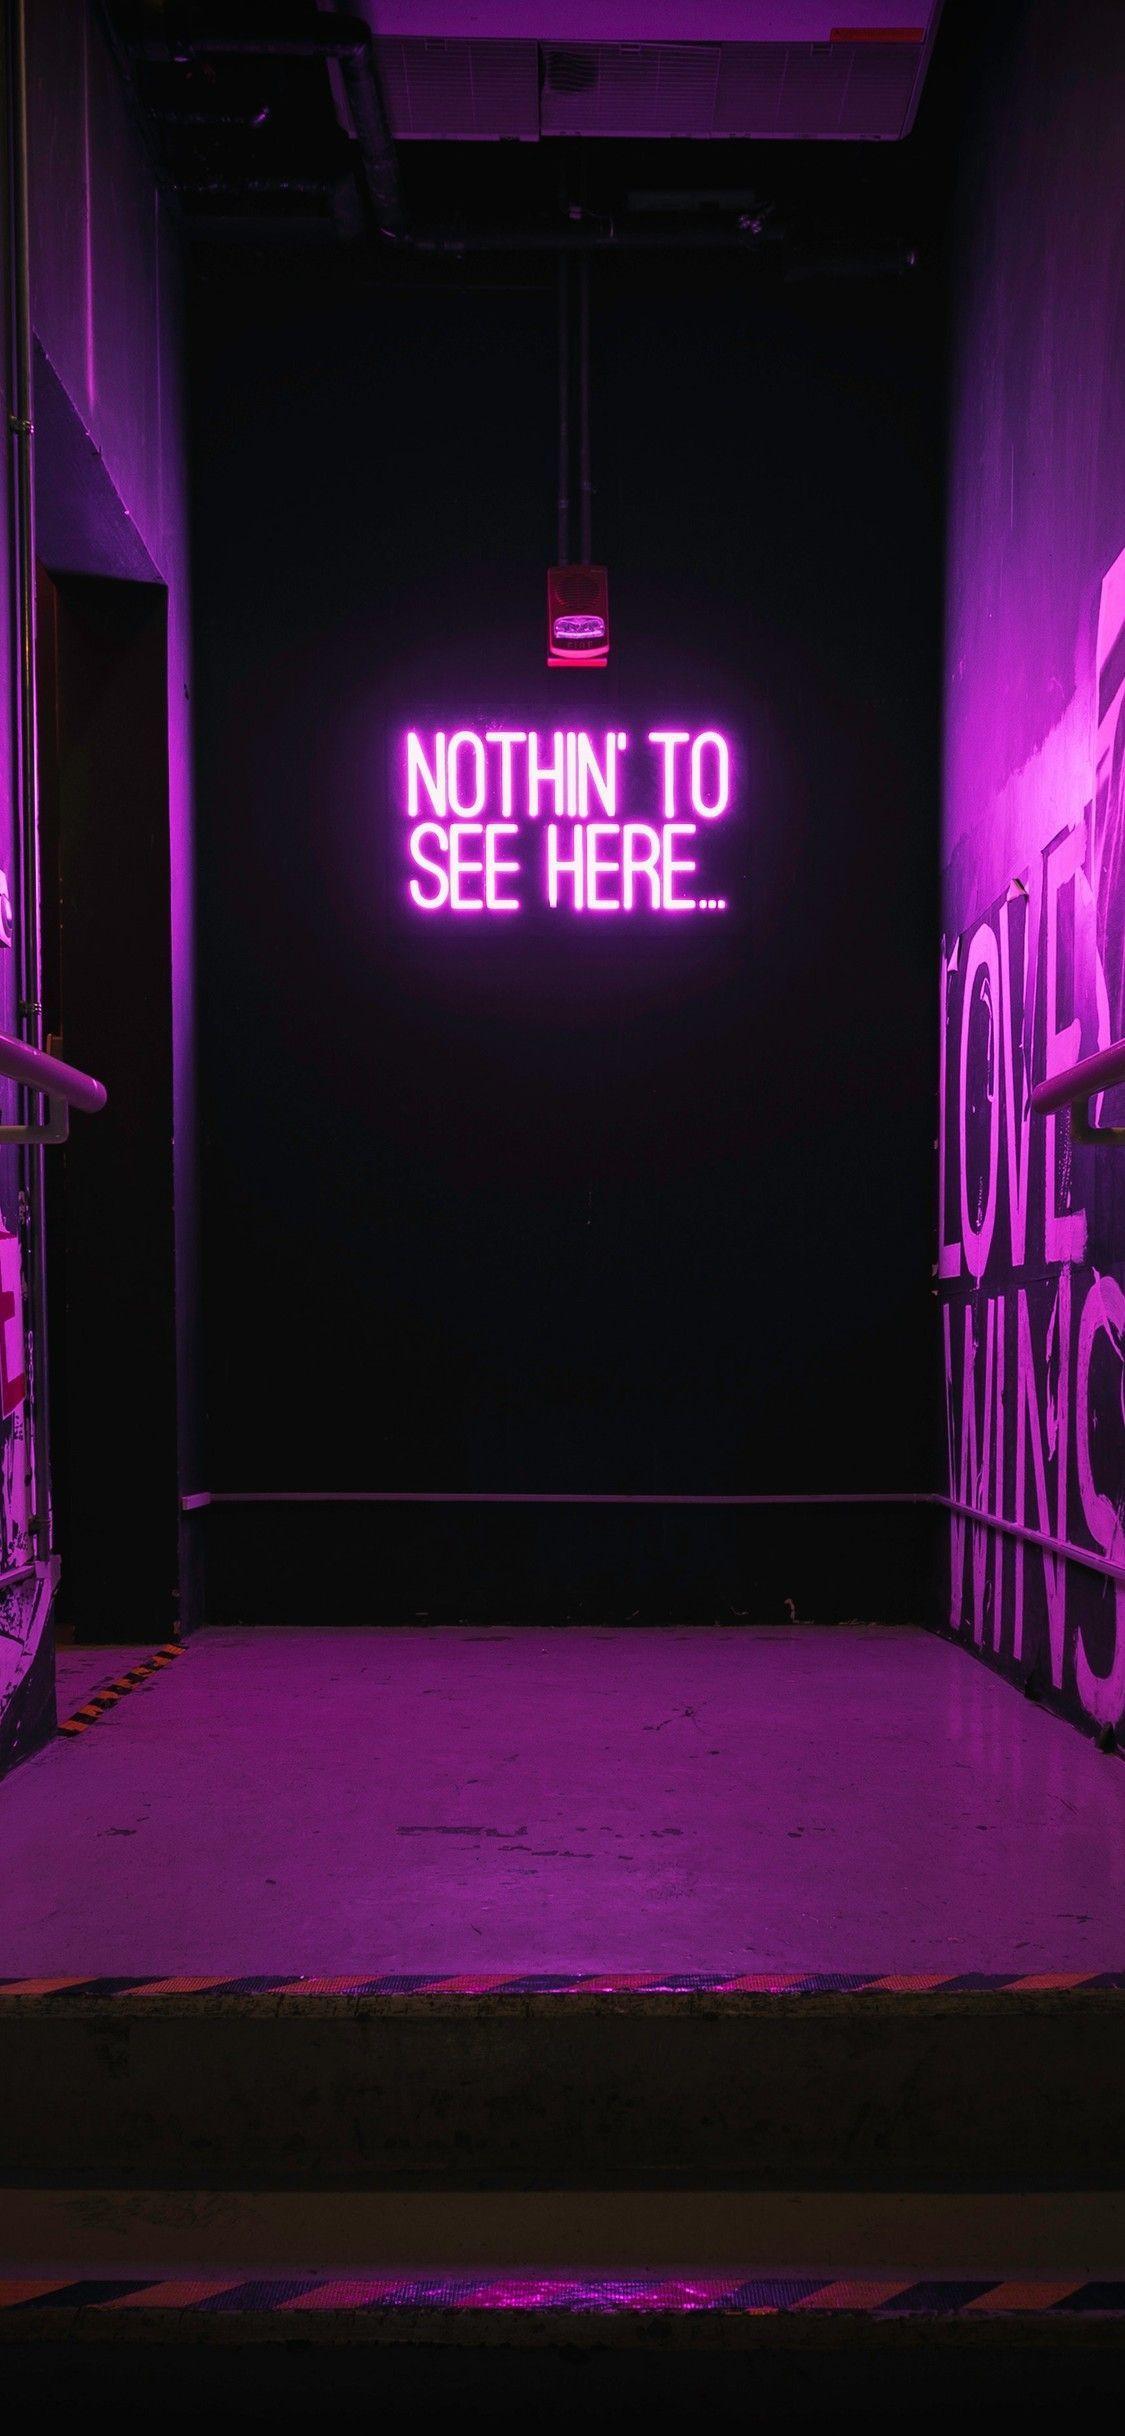 Free download Iphone X Neon Wallpaper ...